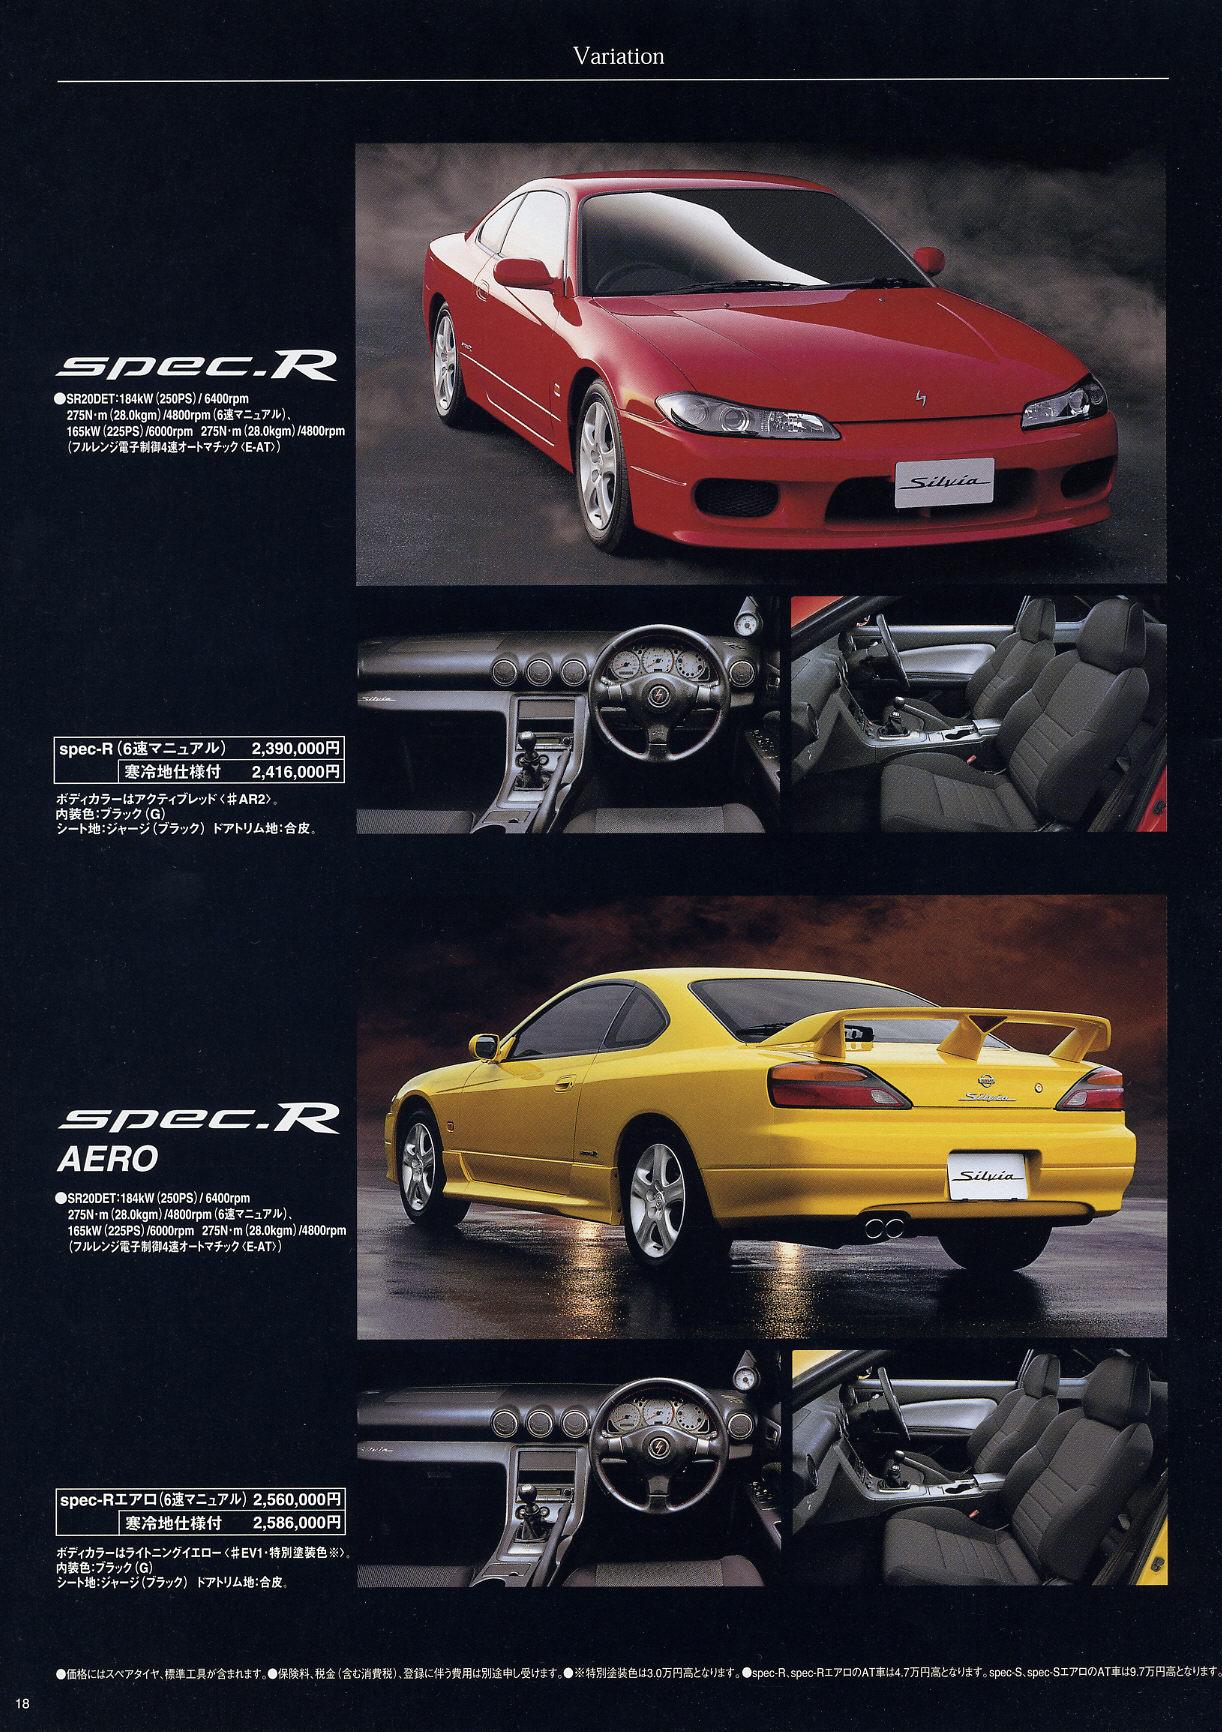 S15 Silvia Original Dealer Brochure (Japan) - 240sx.org